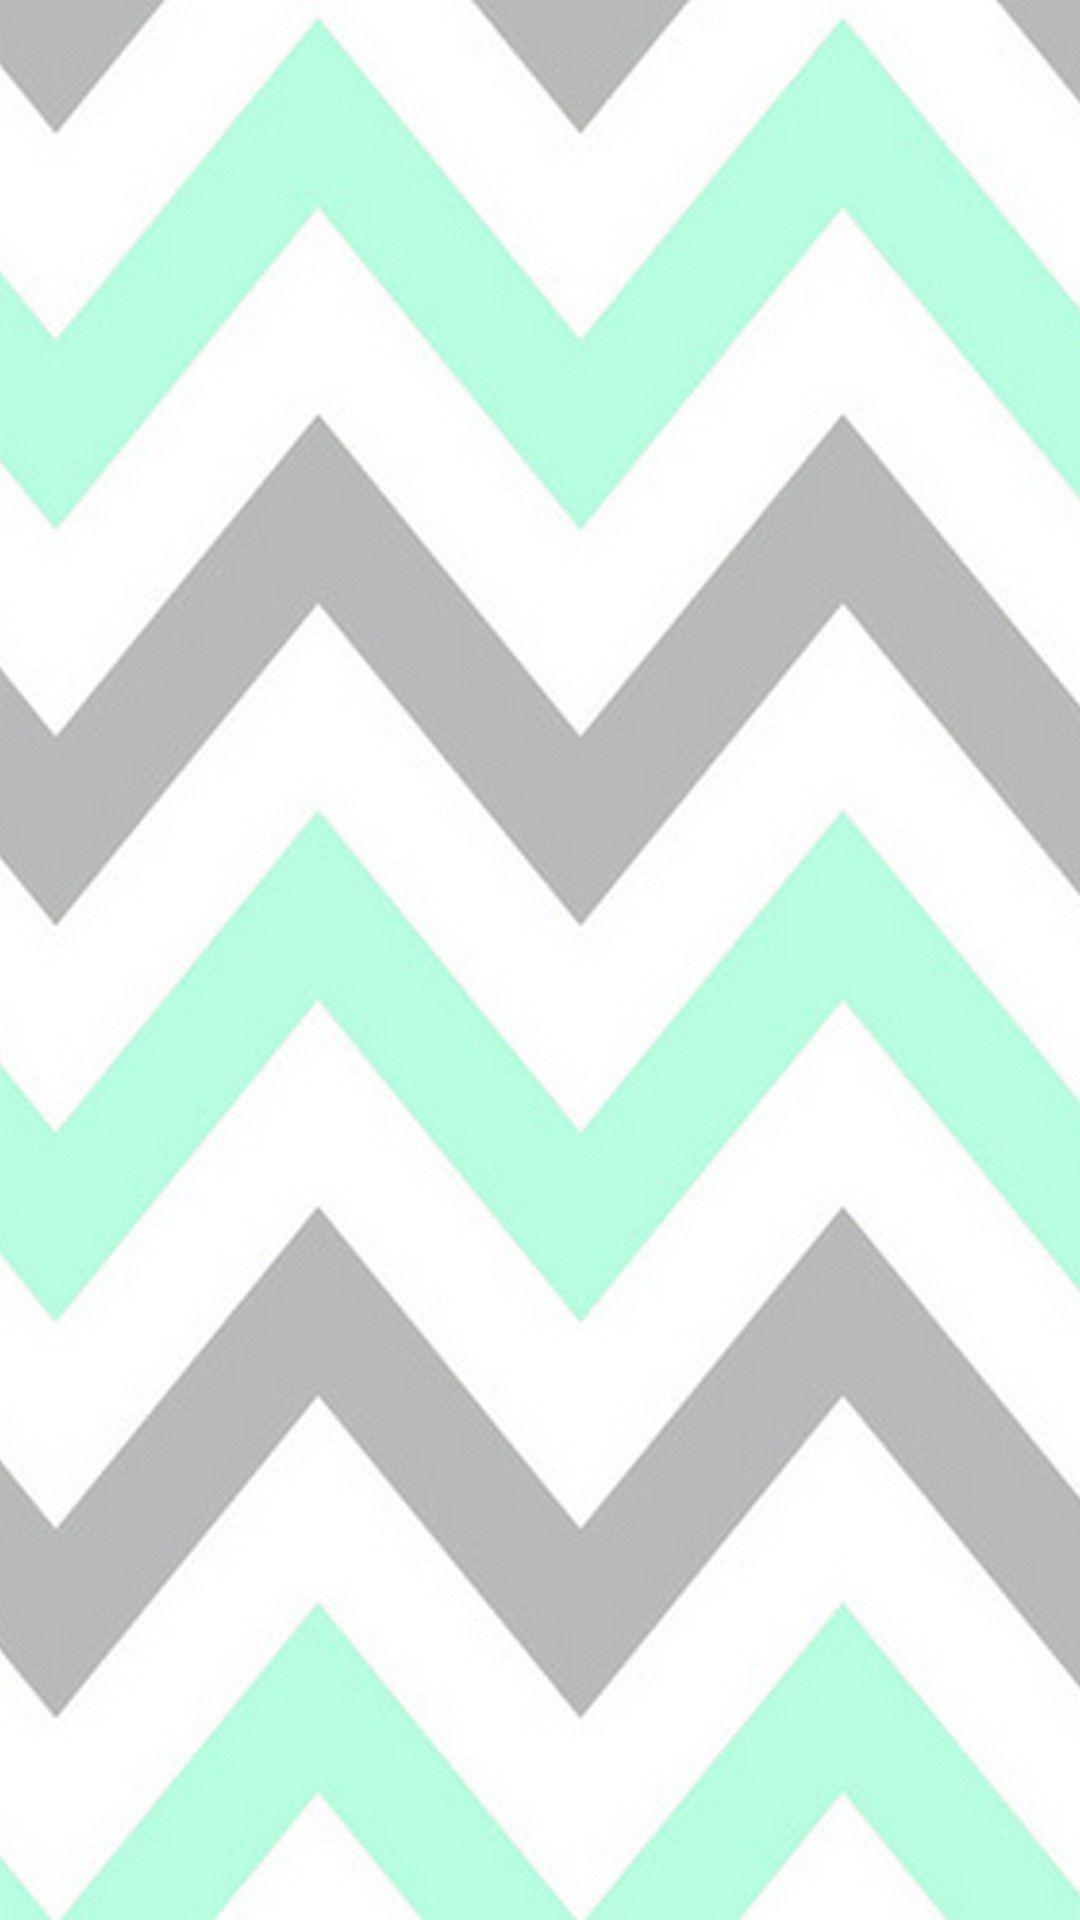 Mint Green Iphone 7 Plus Wallpaper Best Wallpaper Hd Mint Green Wallpaper Iphone Mint Green Wallpaper Iphone 7 Plus Wallpaper